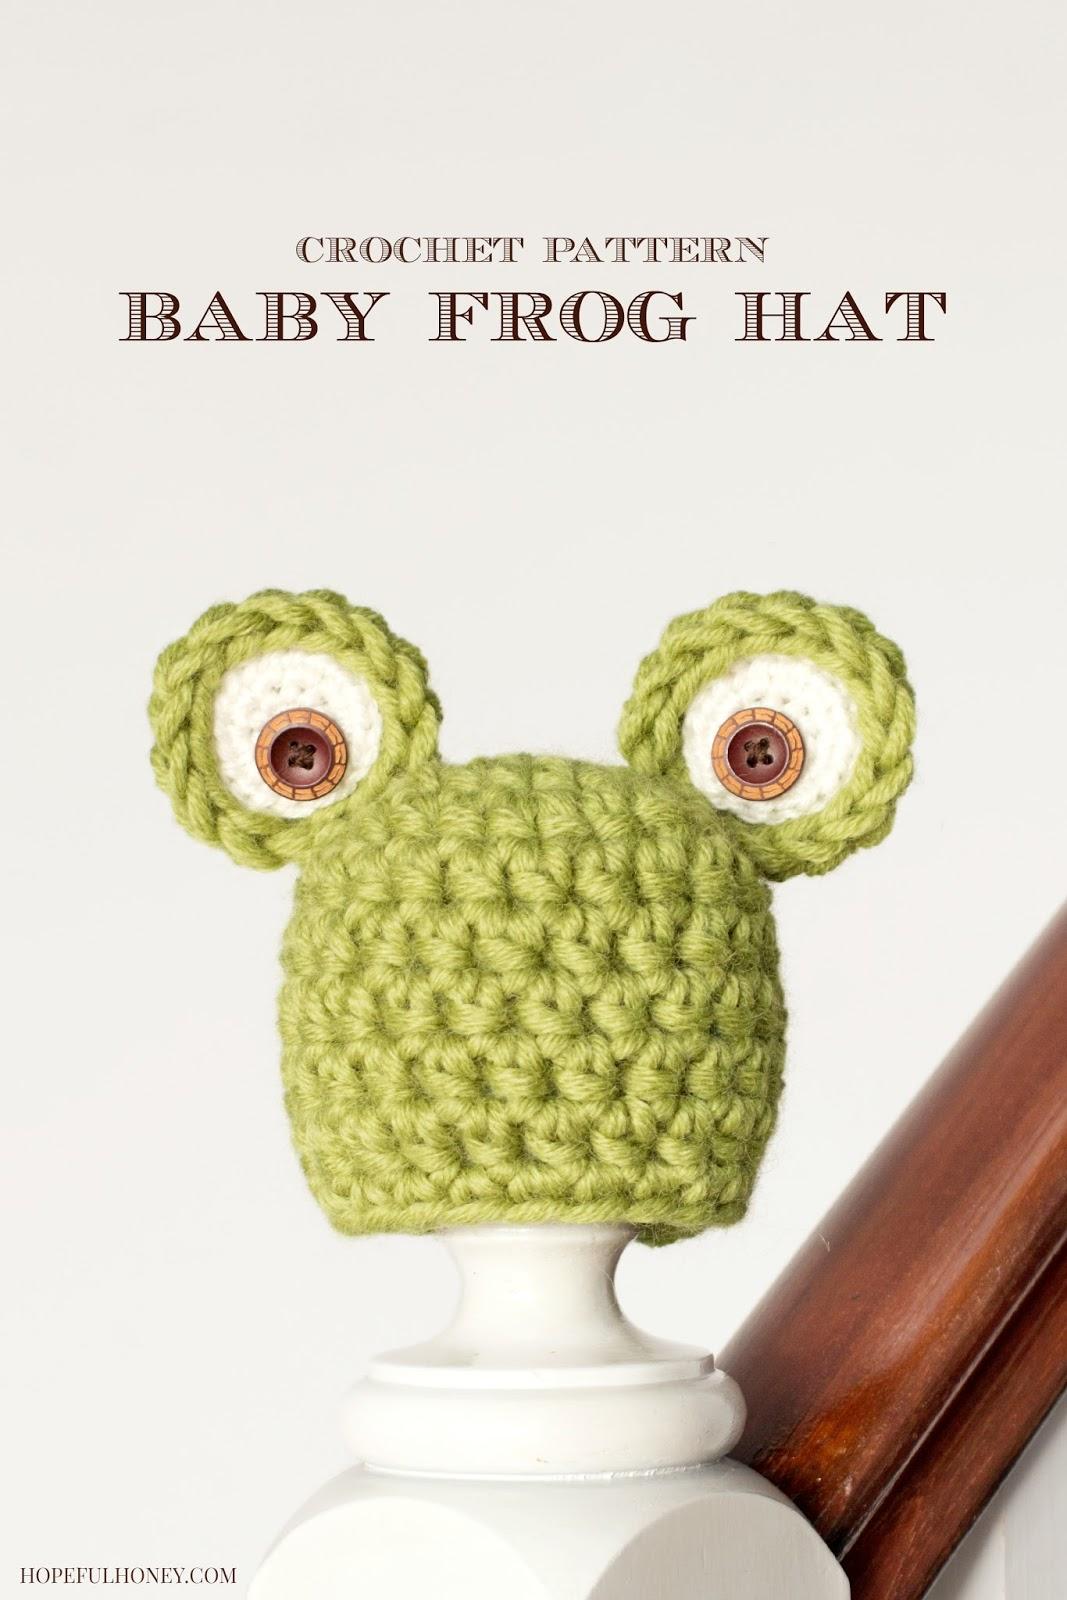 Free Crochet Pattern Newborn Frog Hat : Hopeful Honey Craft, Crochet, Create: Newborn Frog Hat ...